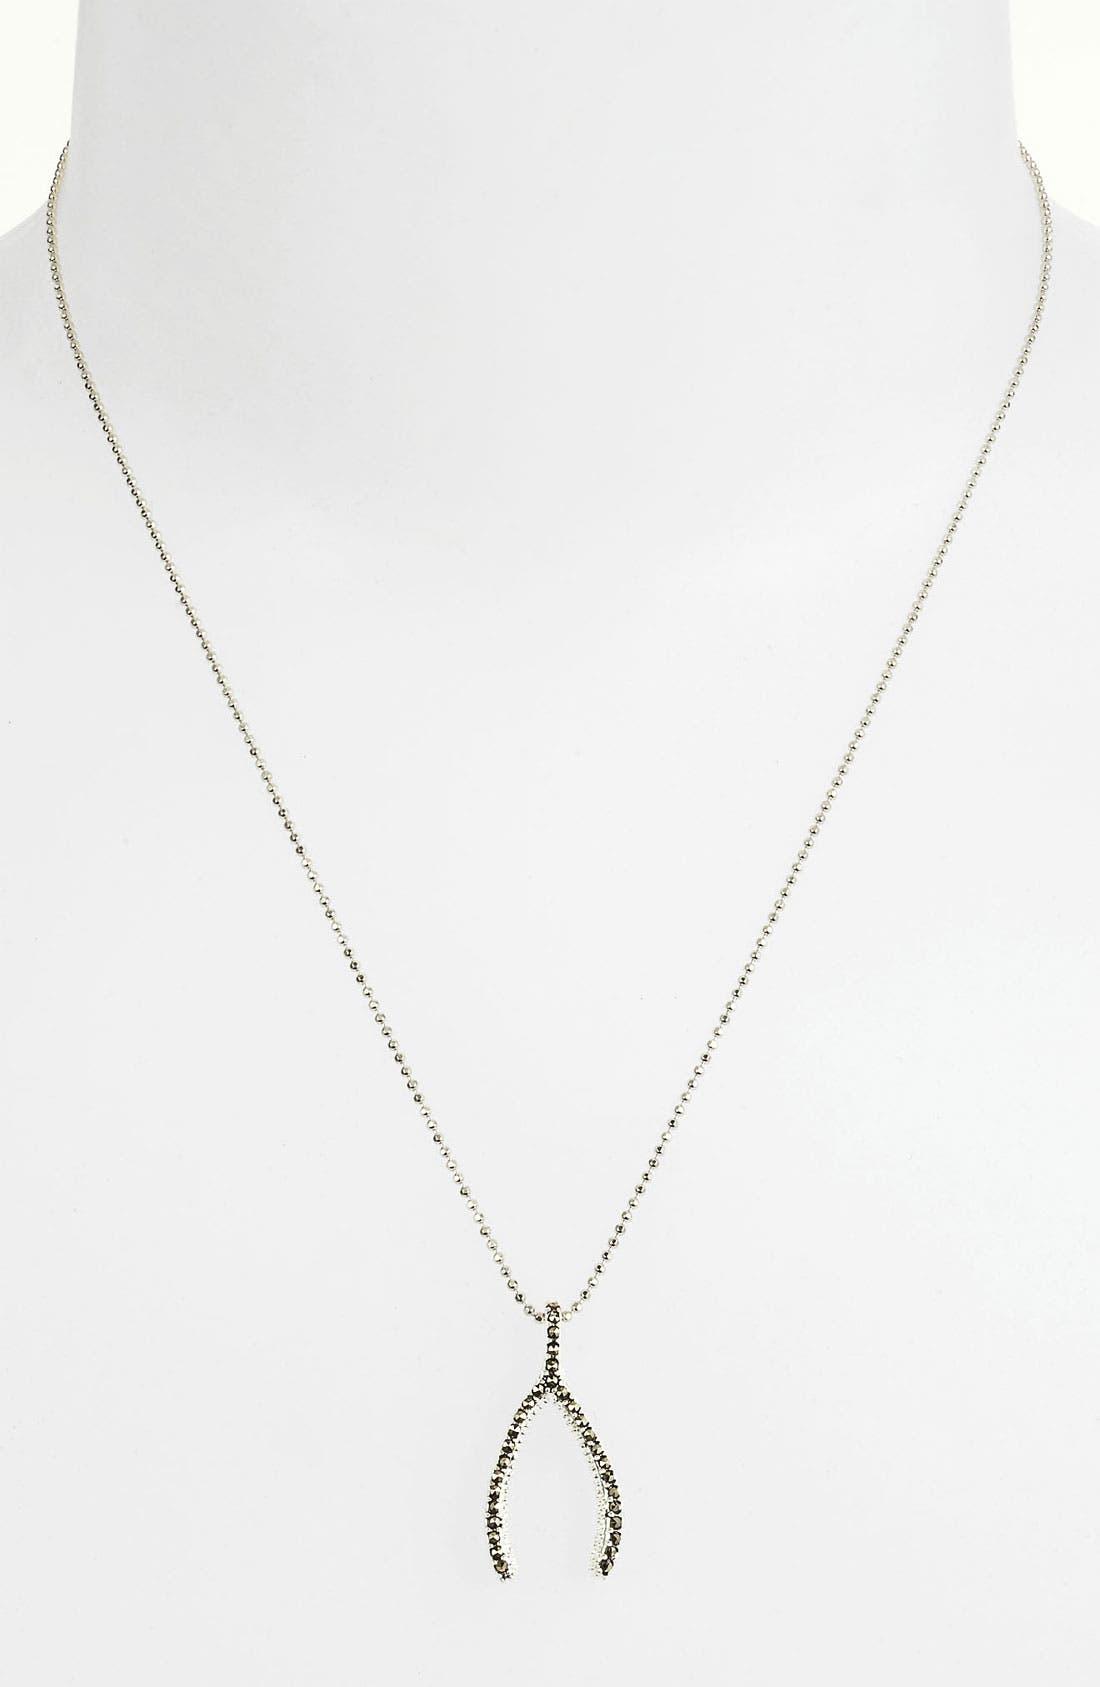 Alternate Image 1 Selected - Judith Jack Reversible Pavé Wishbone Pendant Necklace